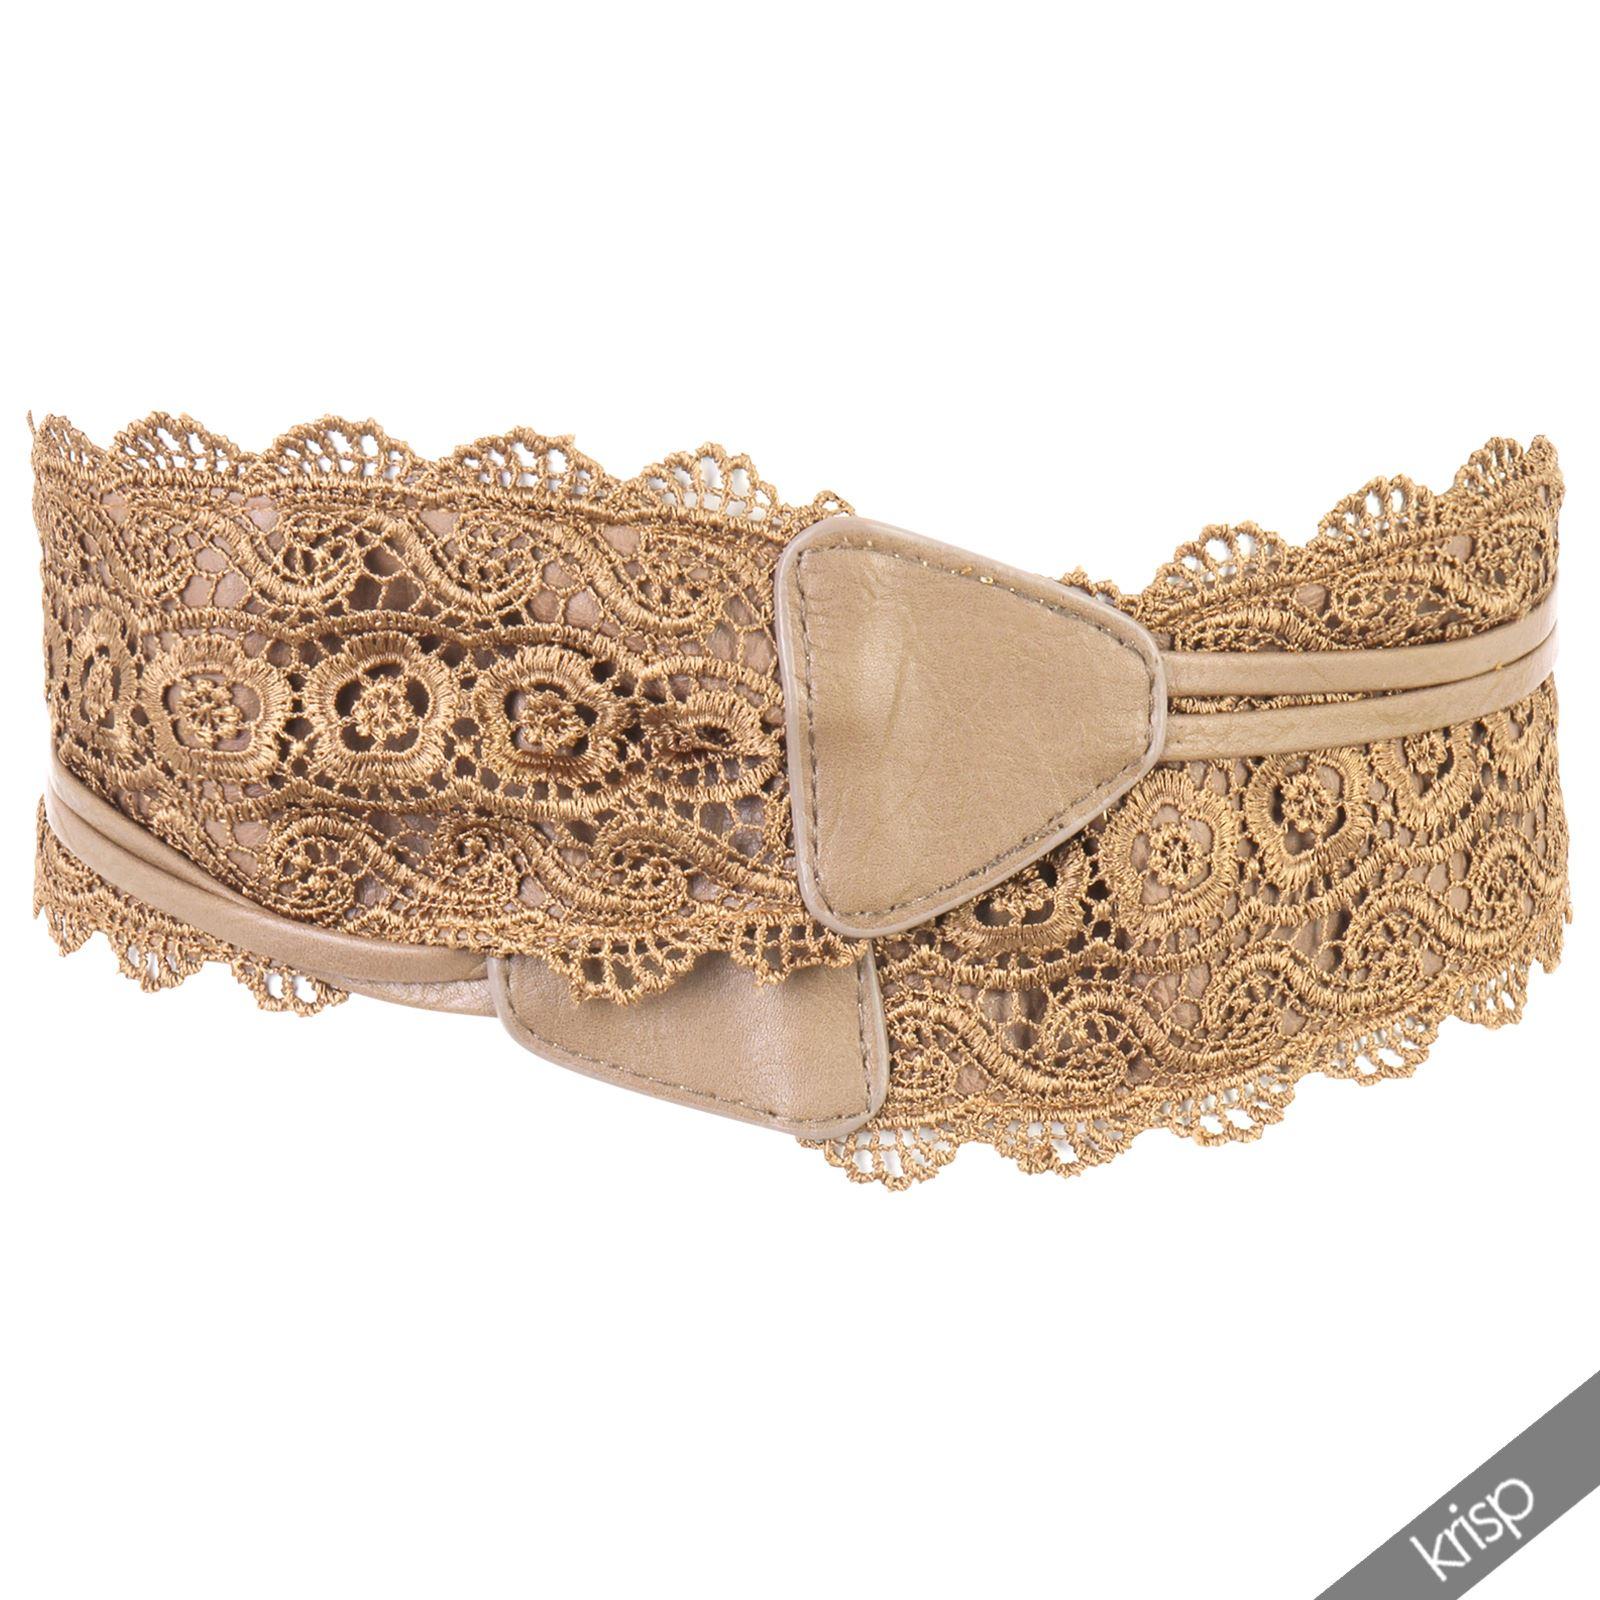 thumbnail 31 - Womens-Ladies-Wide-Waist-Belt-Floral-Waistband-Pattern-Band-Crochet-Lace-Corset